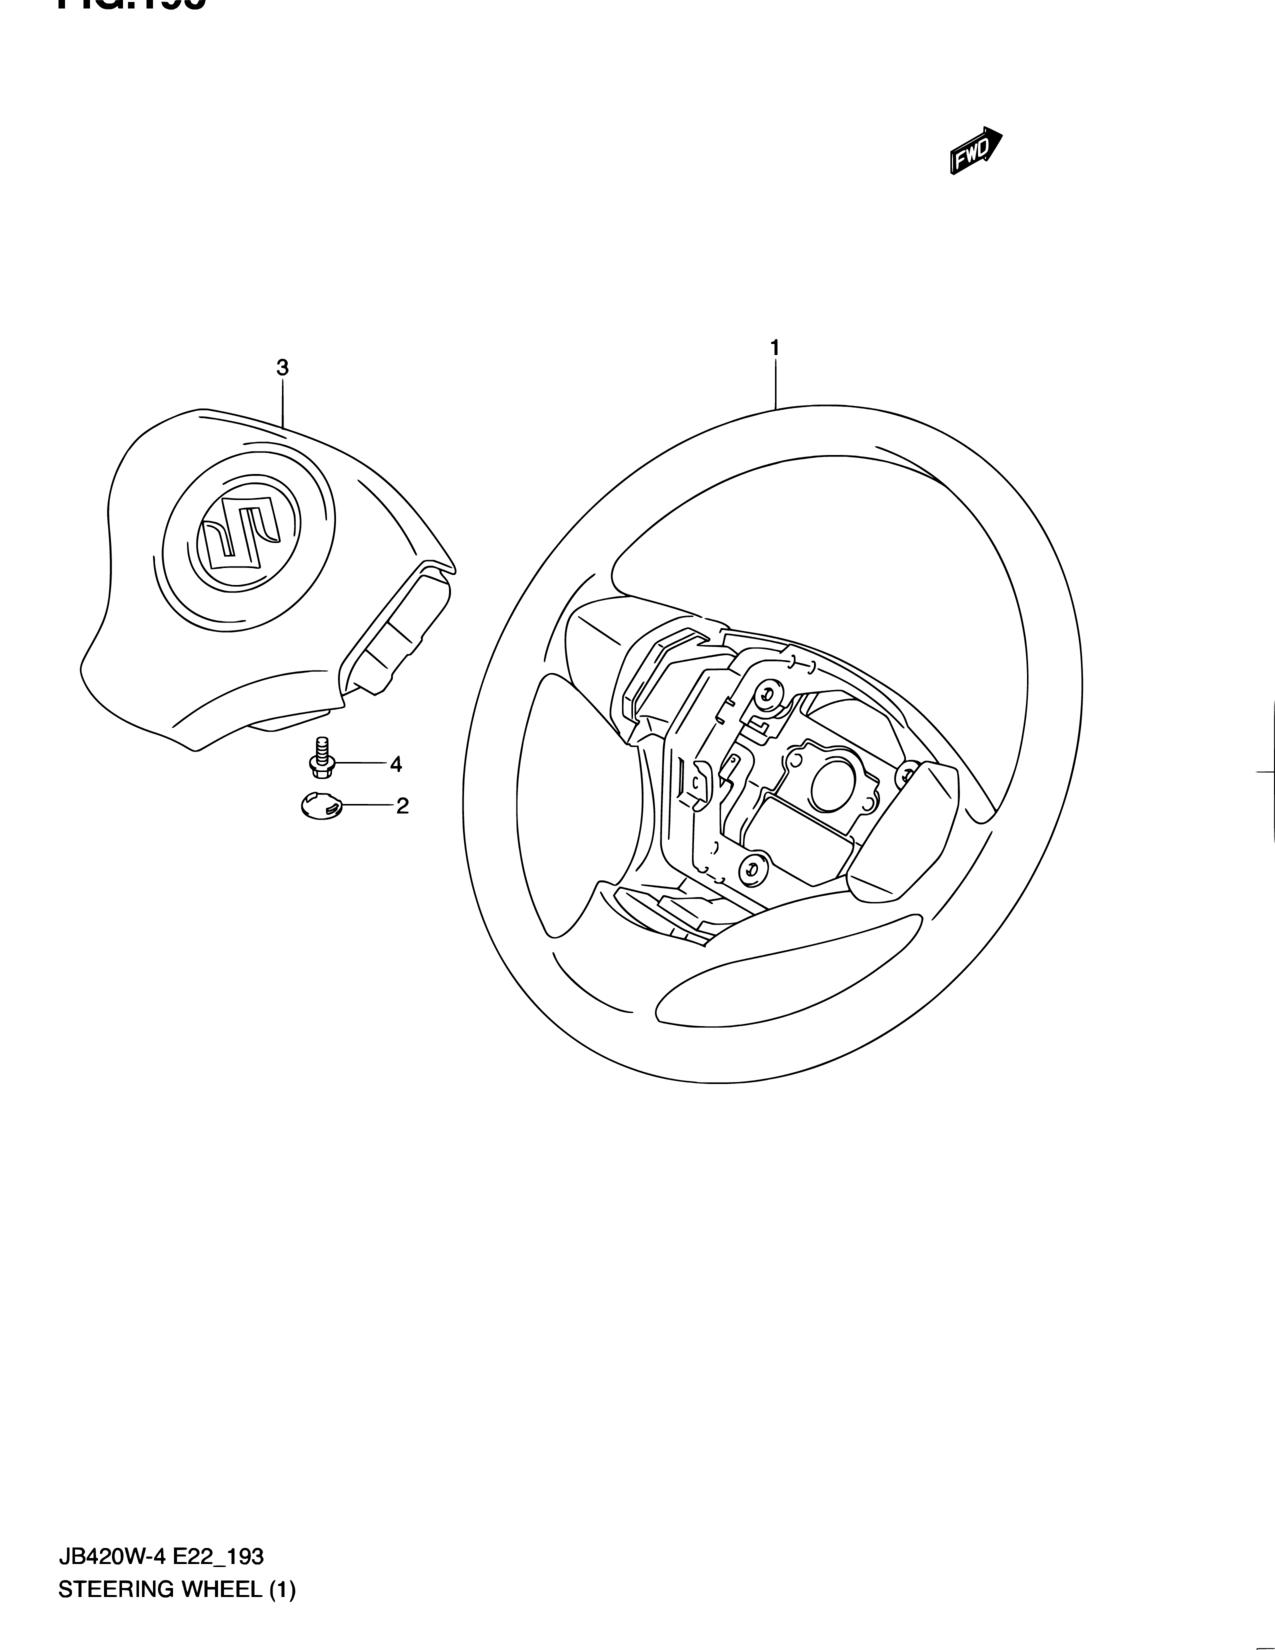 Suzuki Forenza Steering Wheel Diagram Electrical Wiring Diagrams Trusted Rims Pacific Grand Vitara